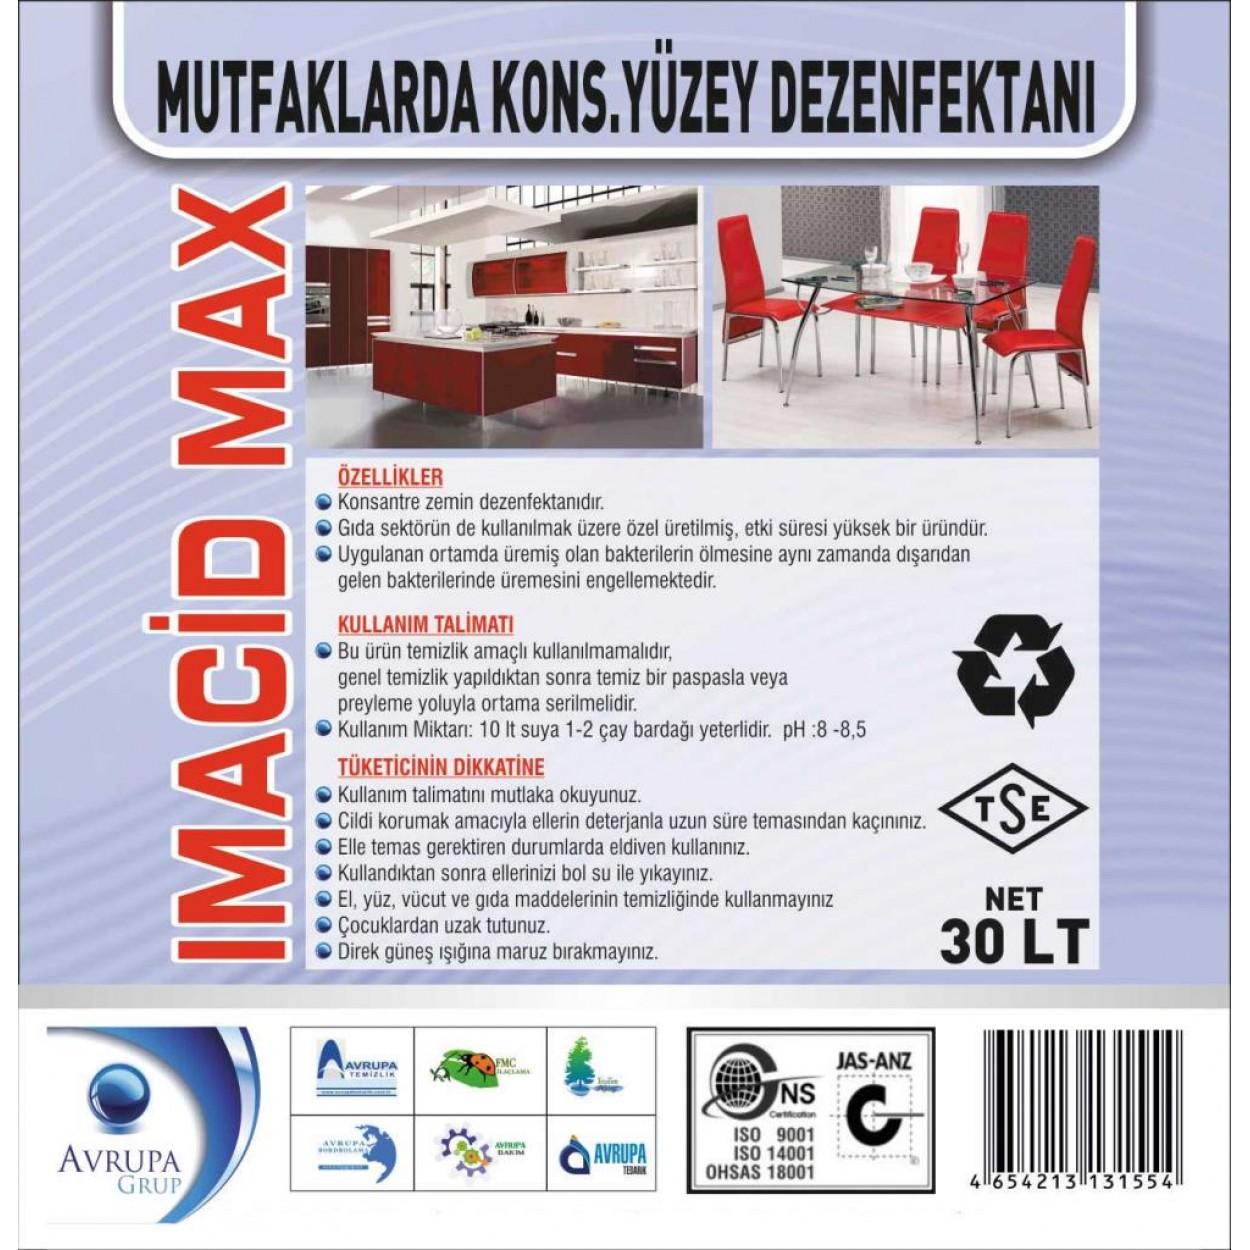 IMACIDE MAX.Mutfaklarda Kons.Yüzey Dezenfektanı 30 Litre